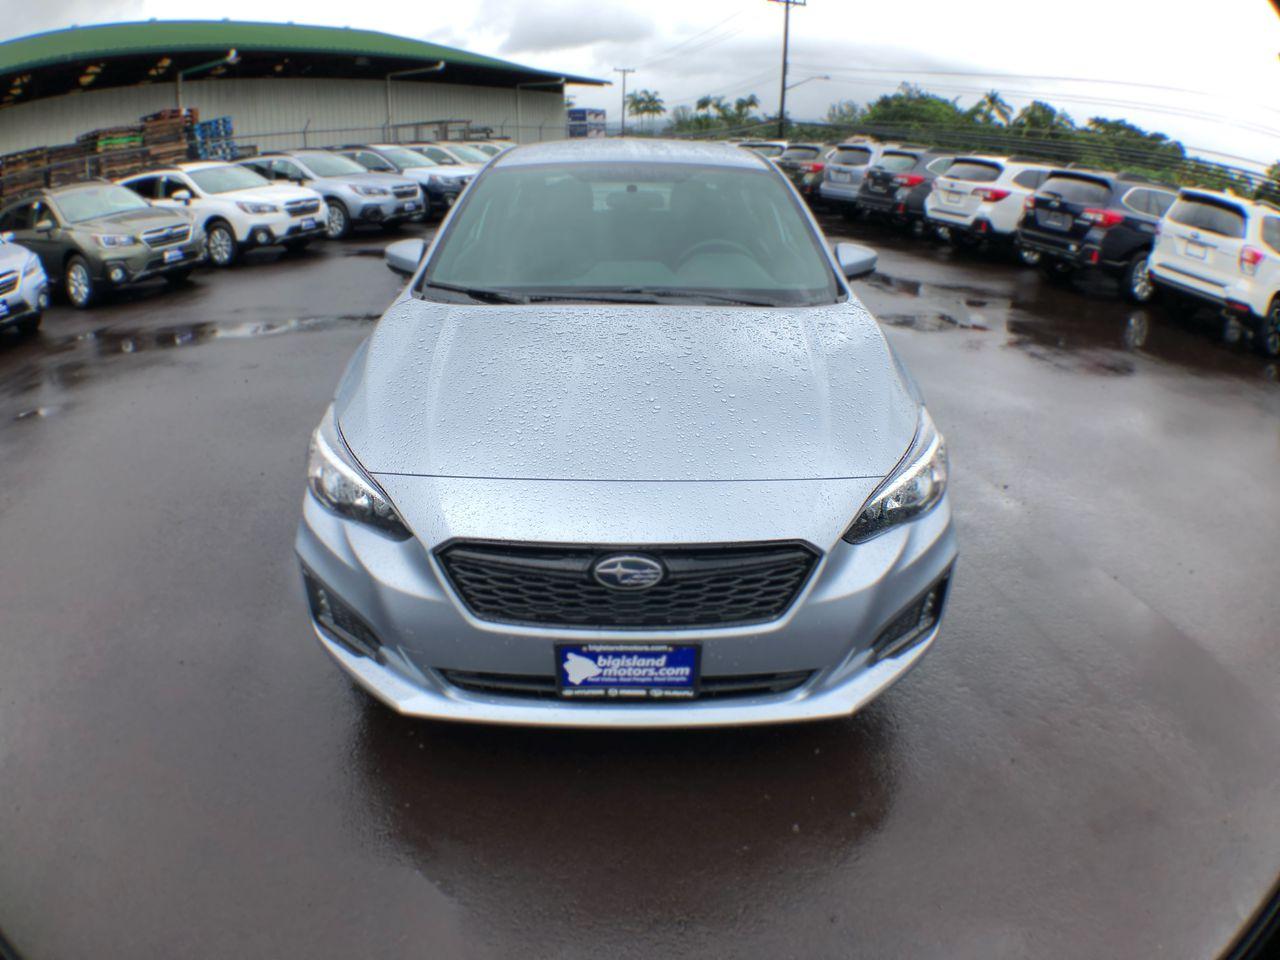 Big Island Motors >> Big Island Motors On Twitter Subaru Is Our Specialty We